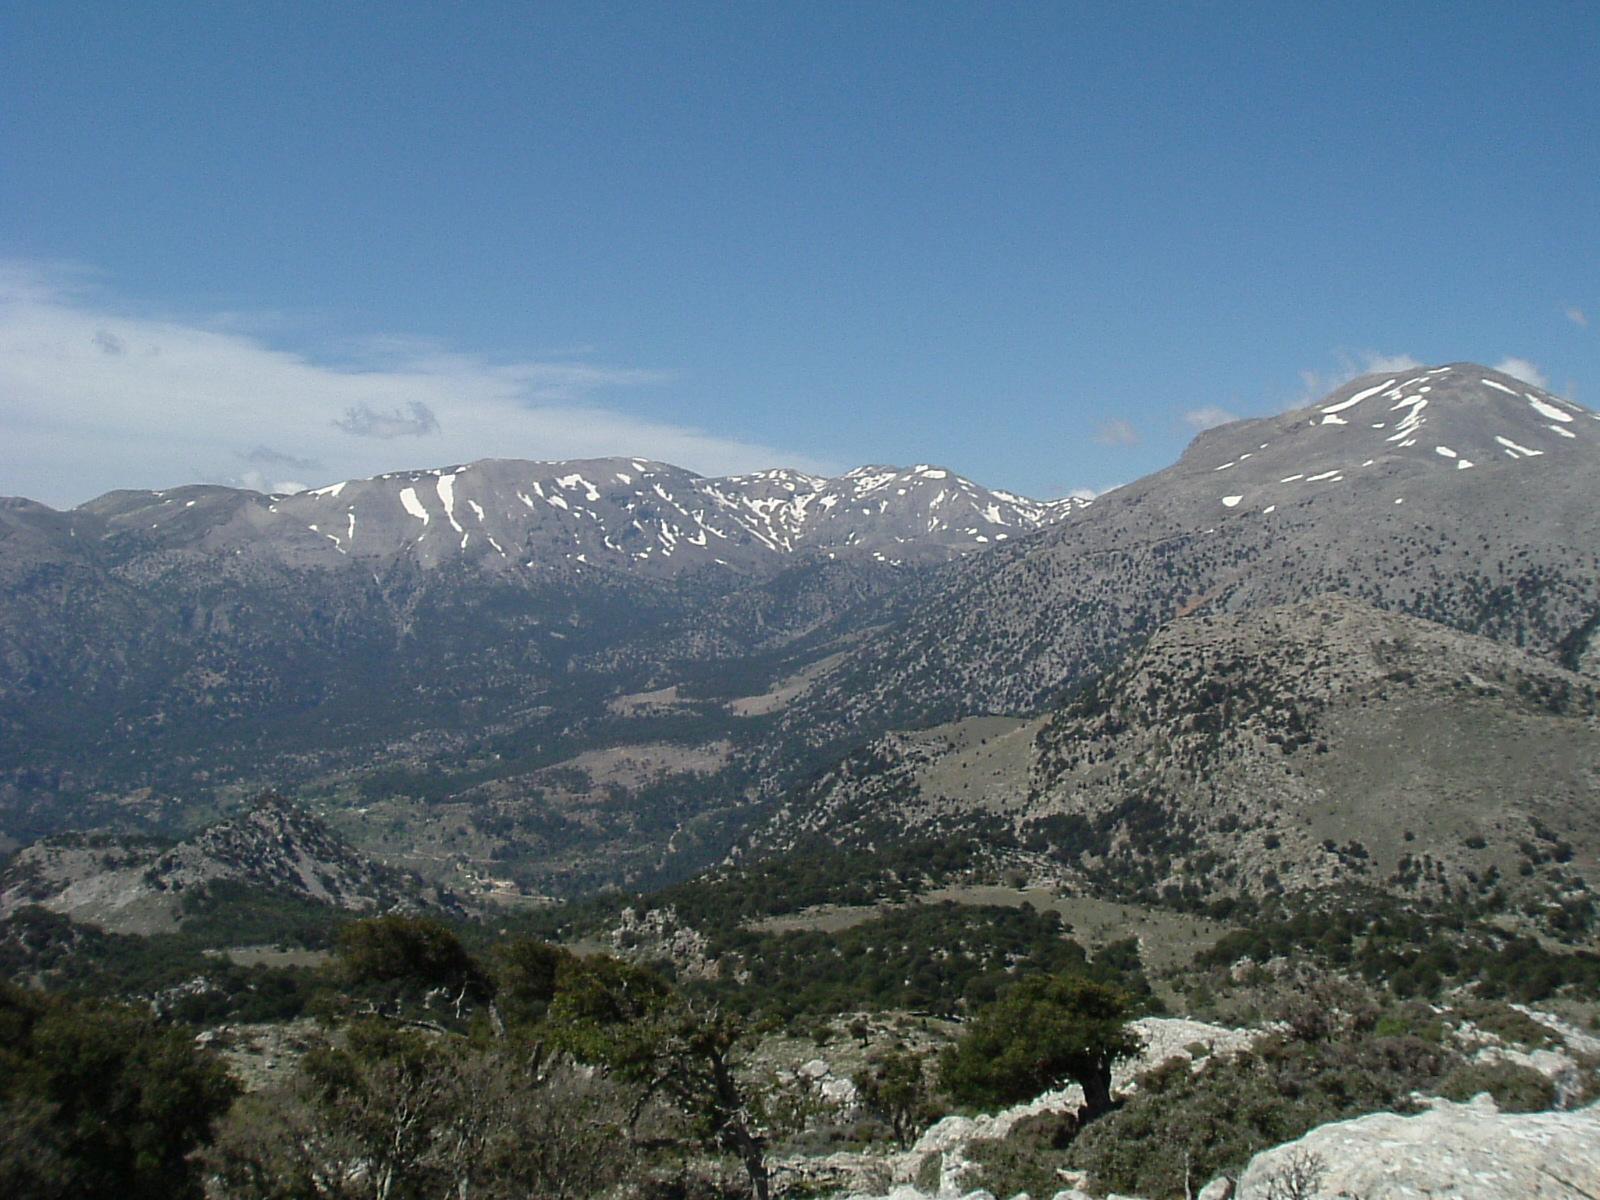 File:Dikti mountain, Crete, Greece.jpg - Wikimedia Commons Mountain